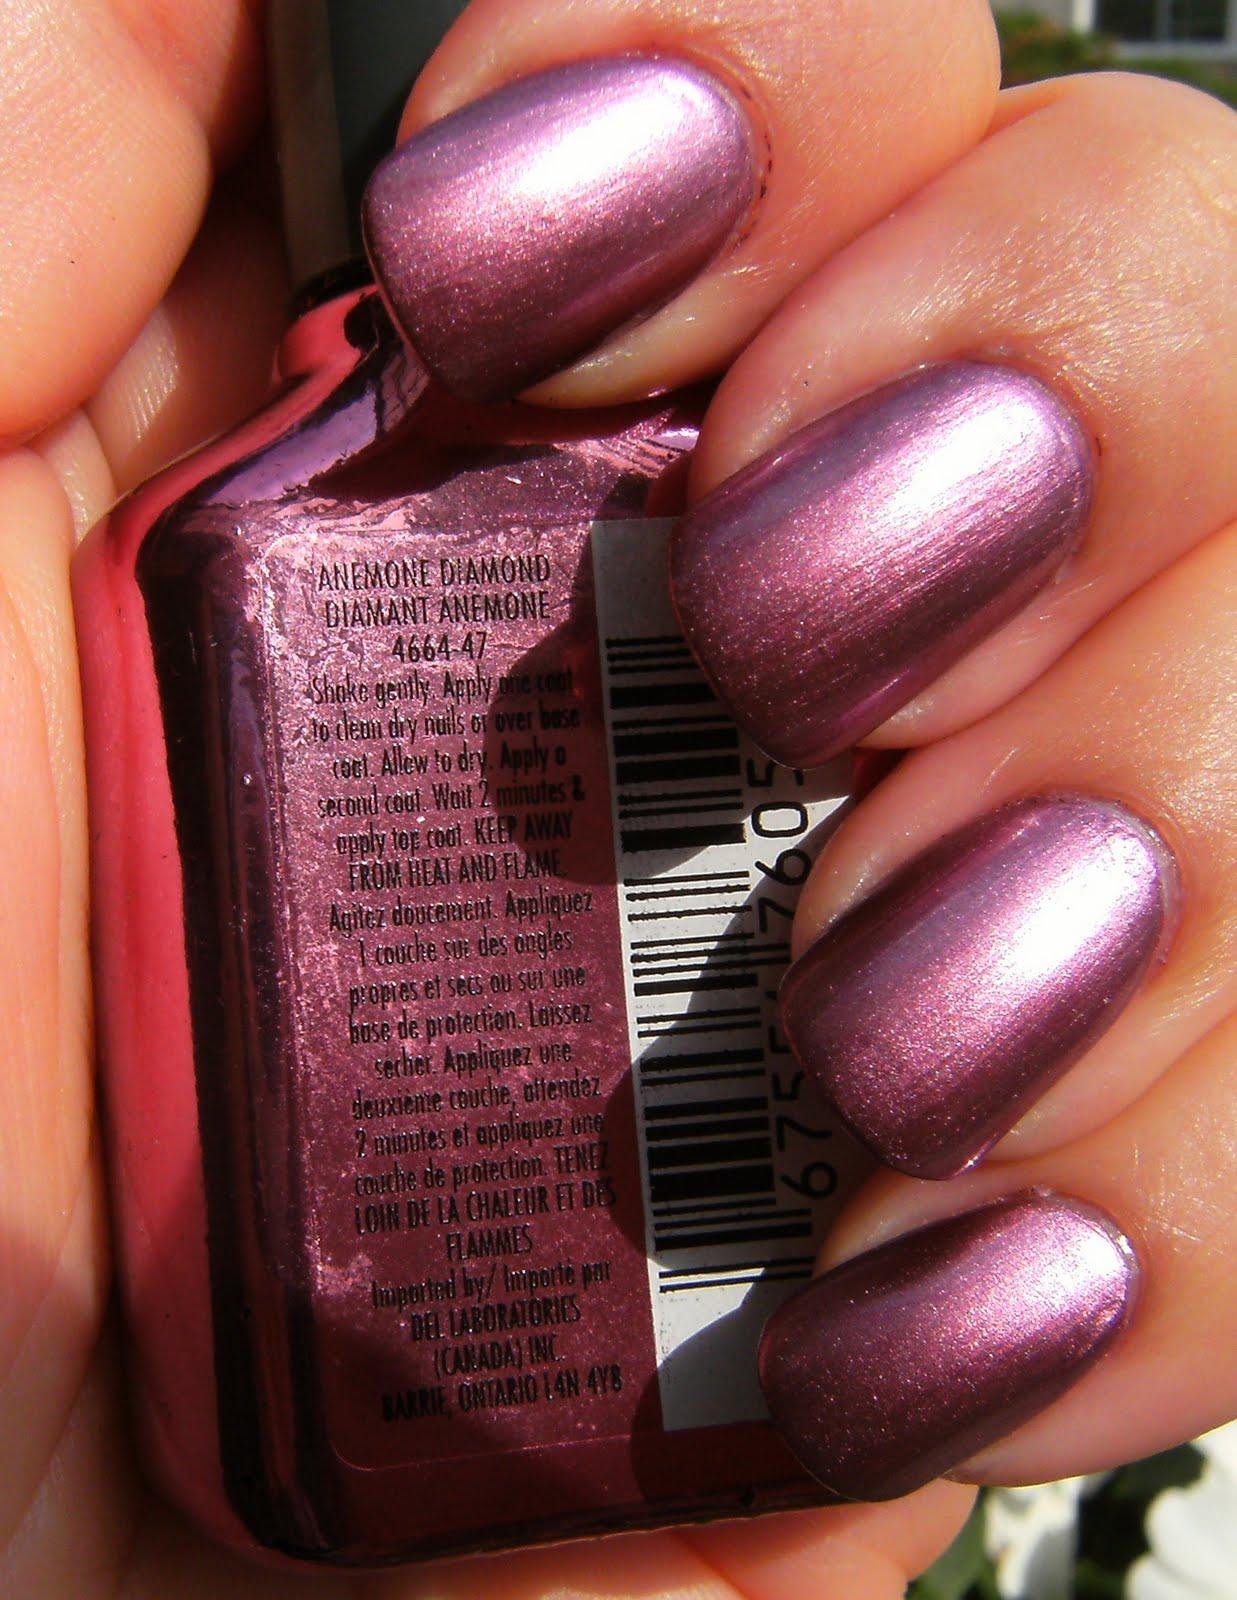 http://2.bp.blogspot.com/_bvQ4YJ17888/TCTuKLkbBJI/AAAAAAAAQy0/HA6s3y_a7UM/s1600/sally+hansen+anemone++diamond+chrome+and+fiery+pink+diamond+chrome+chevron+tips+----deez-nailz---+%282%29.JPG